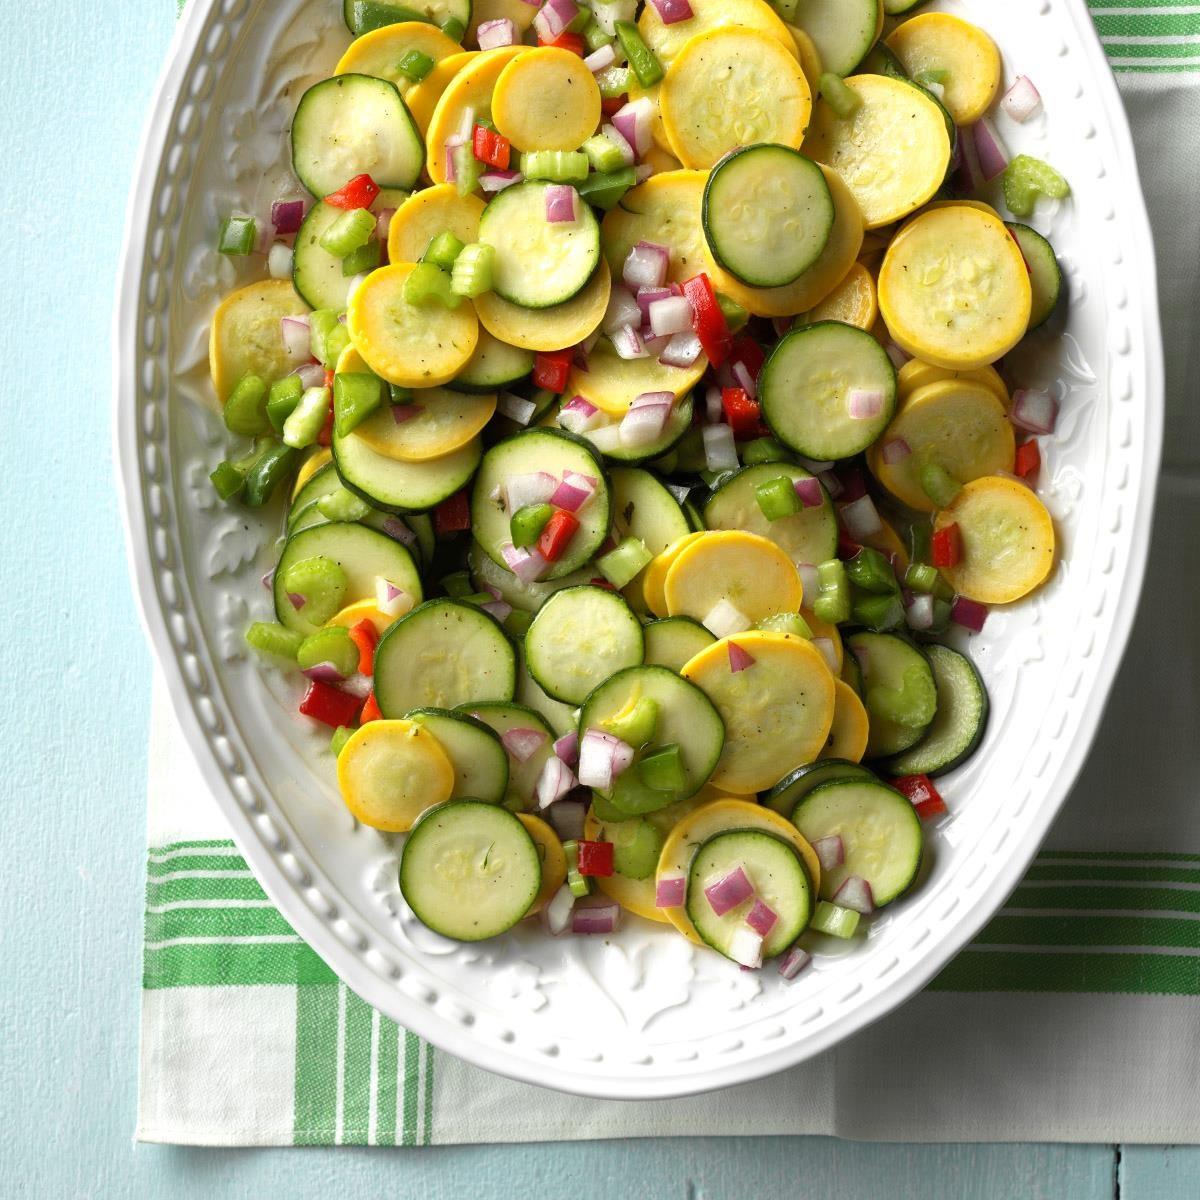 Texas: Sweet & Sour Squash Salad